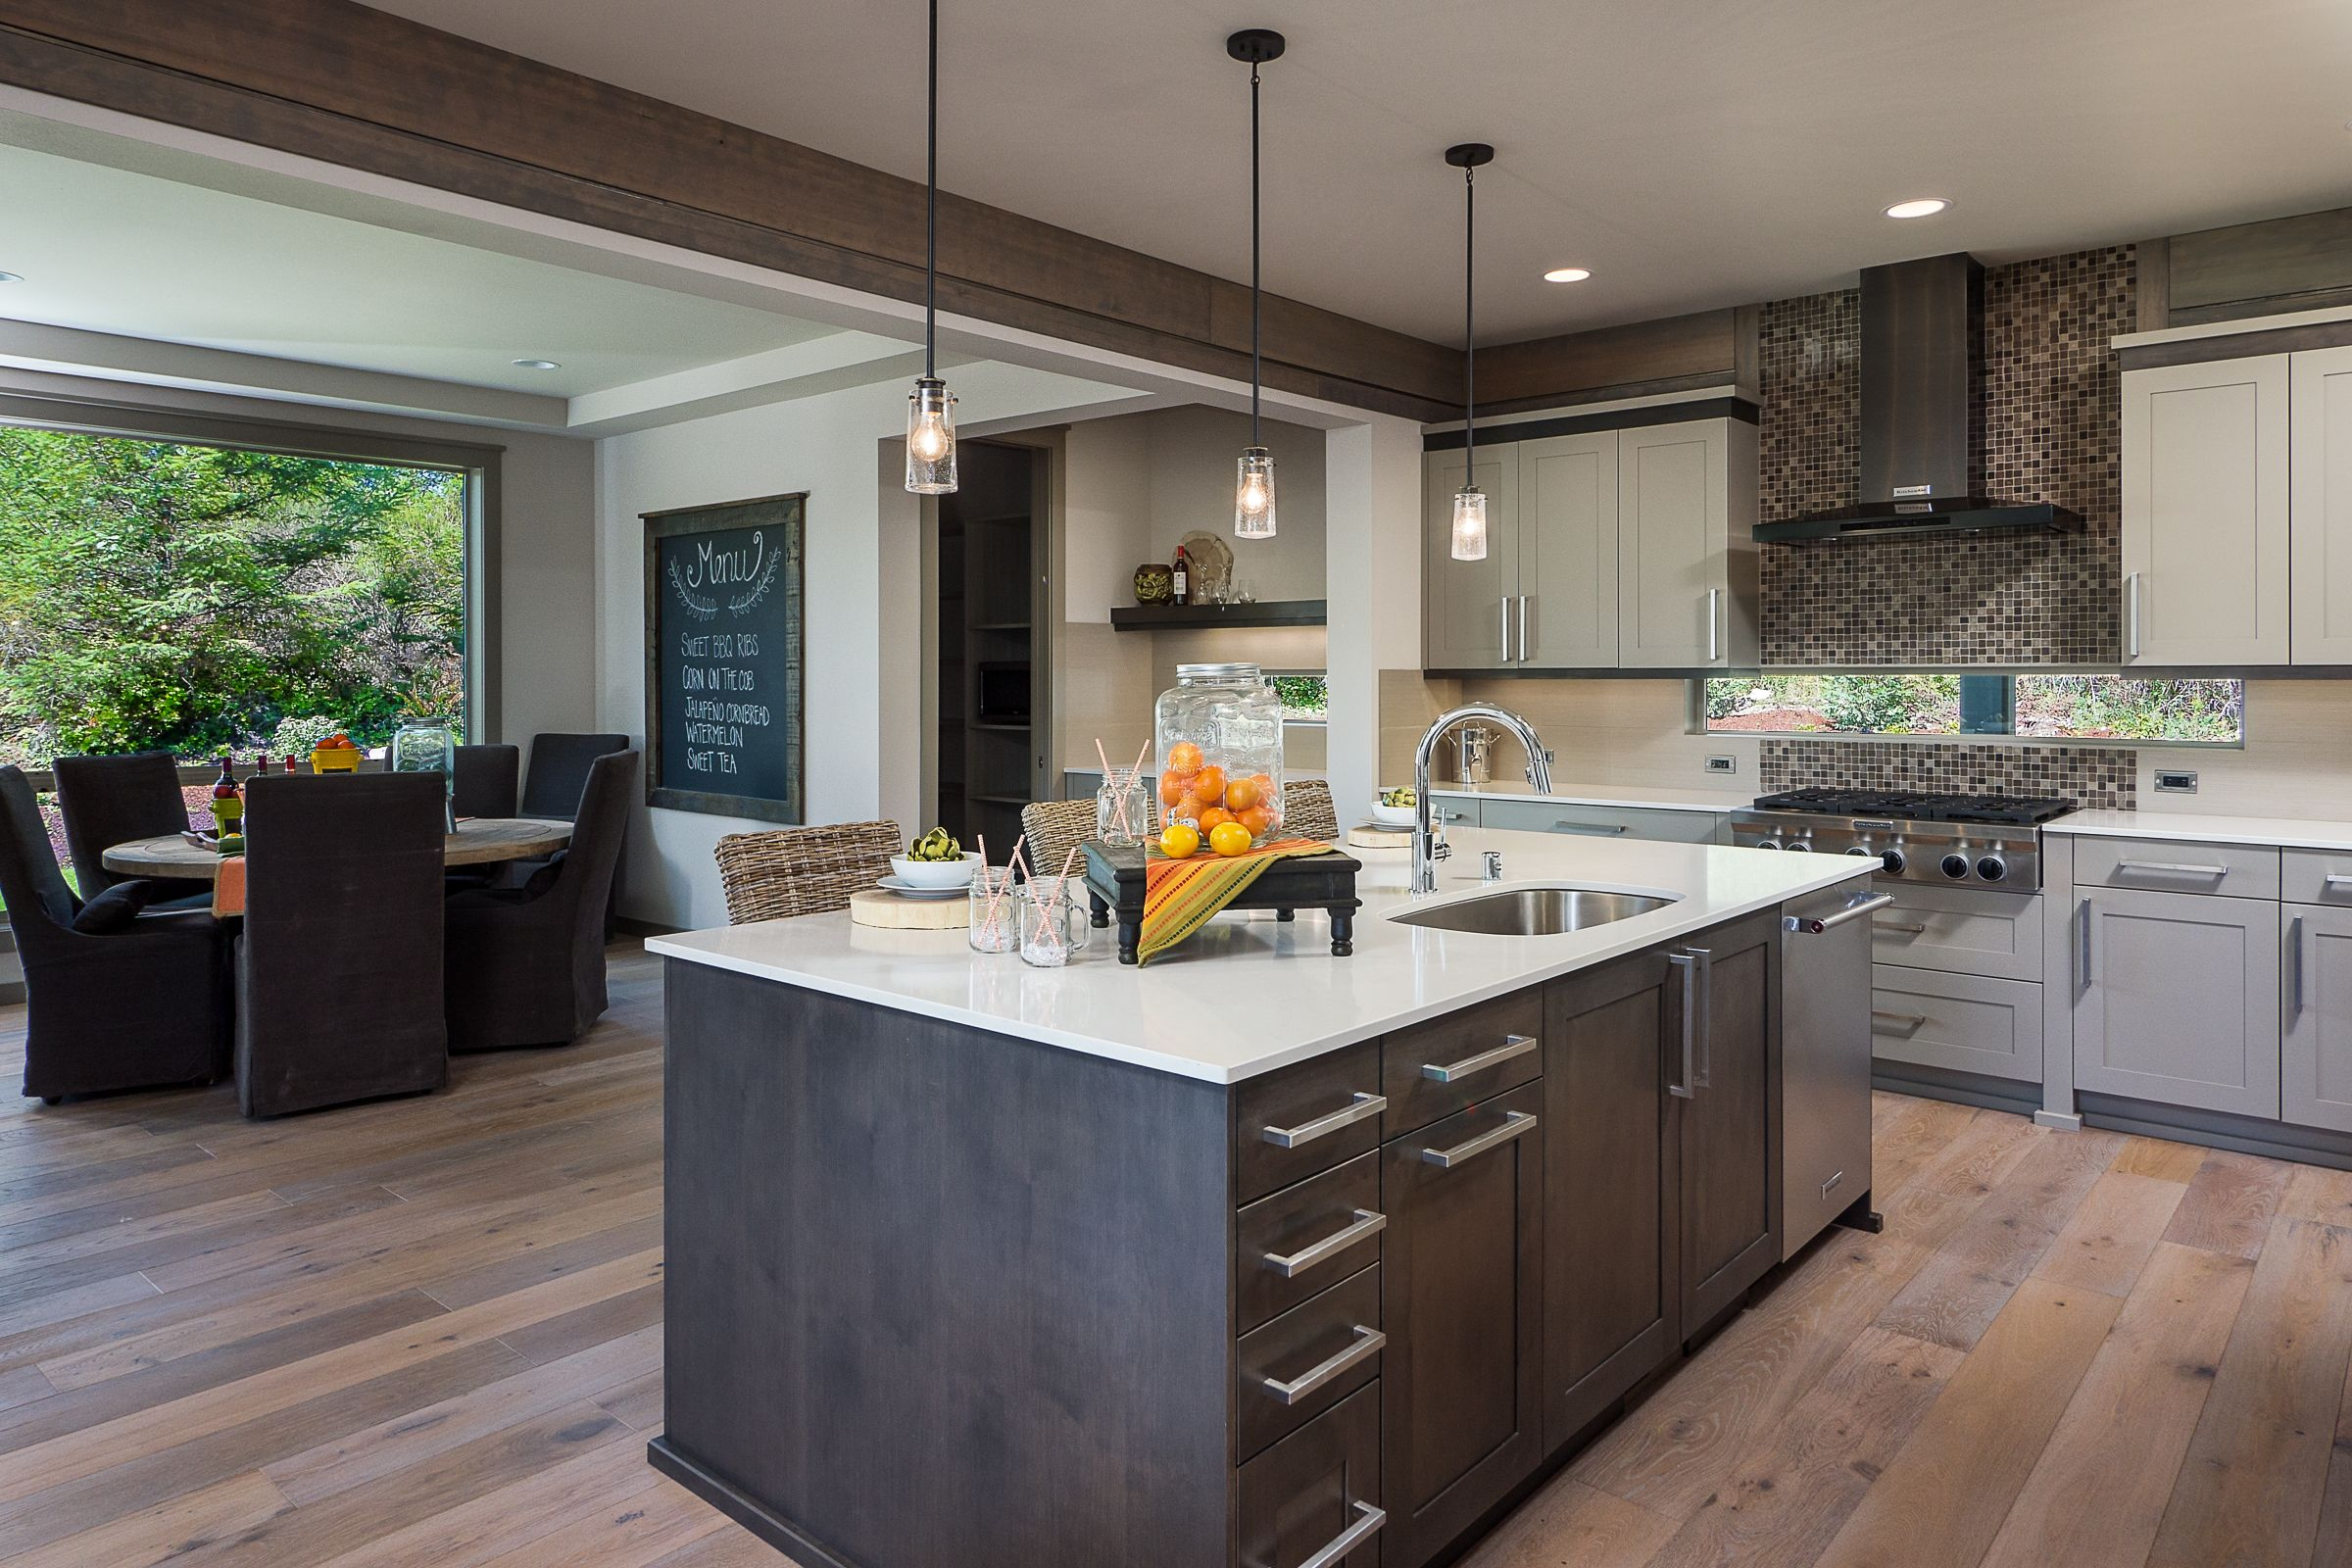 Latitude Cabinets Index Alder Folkstone Index Greige Paint Kitchen Design Order Kitchen Cabinets Pantry Cabinet